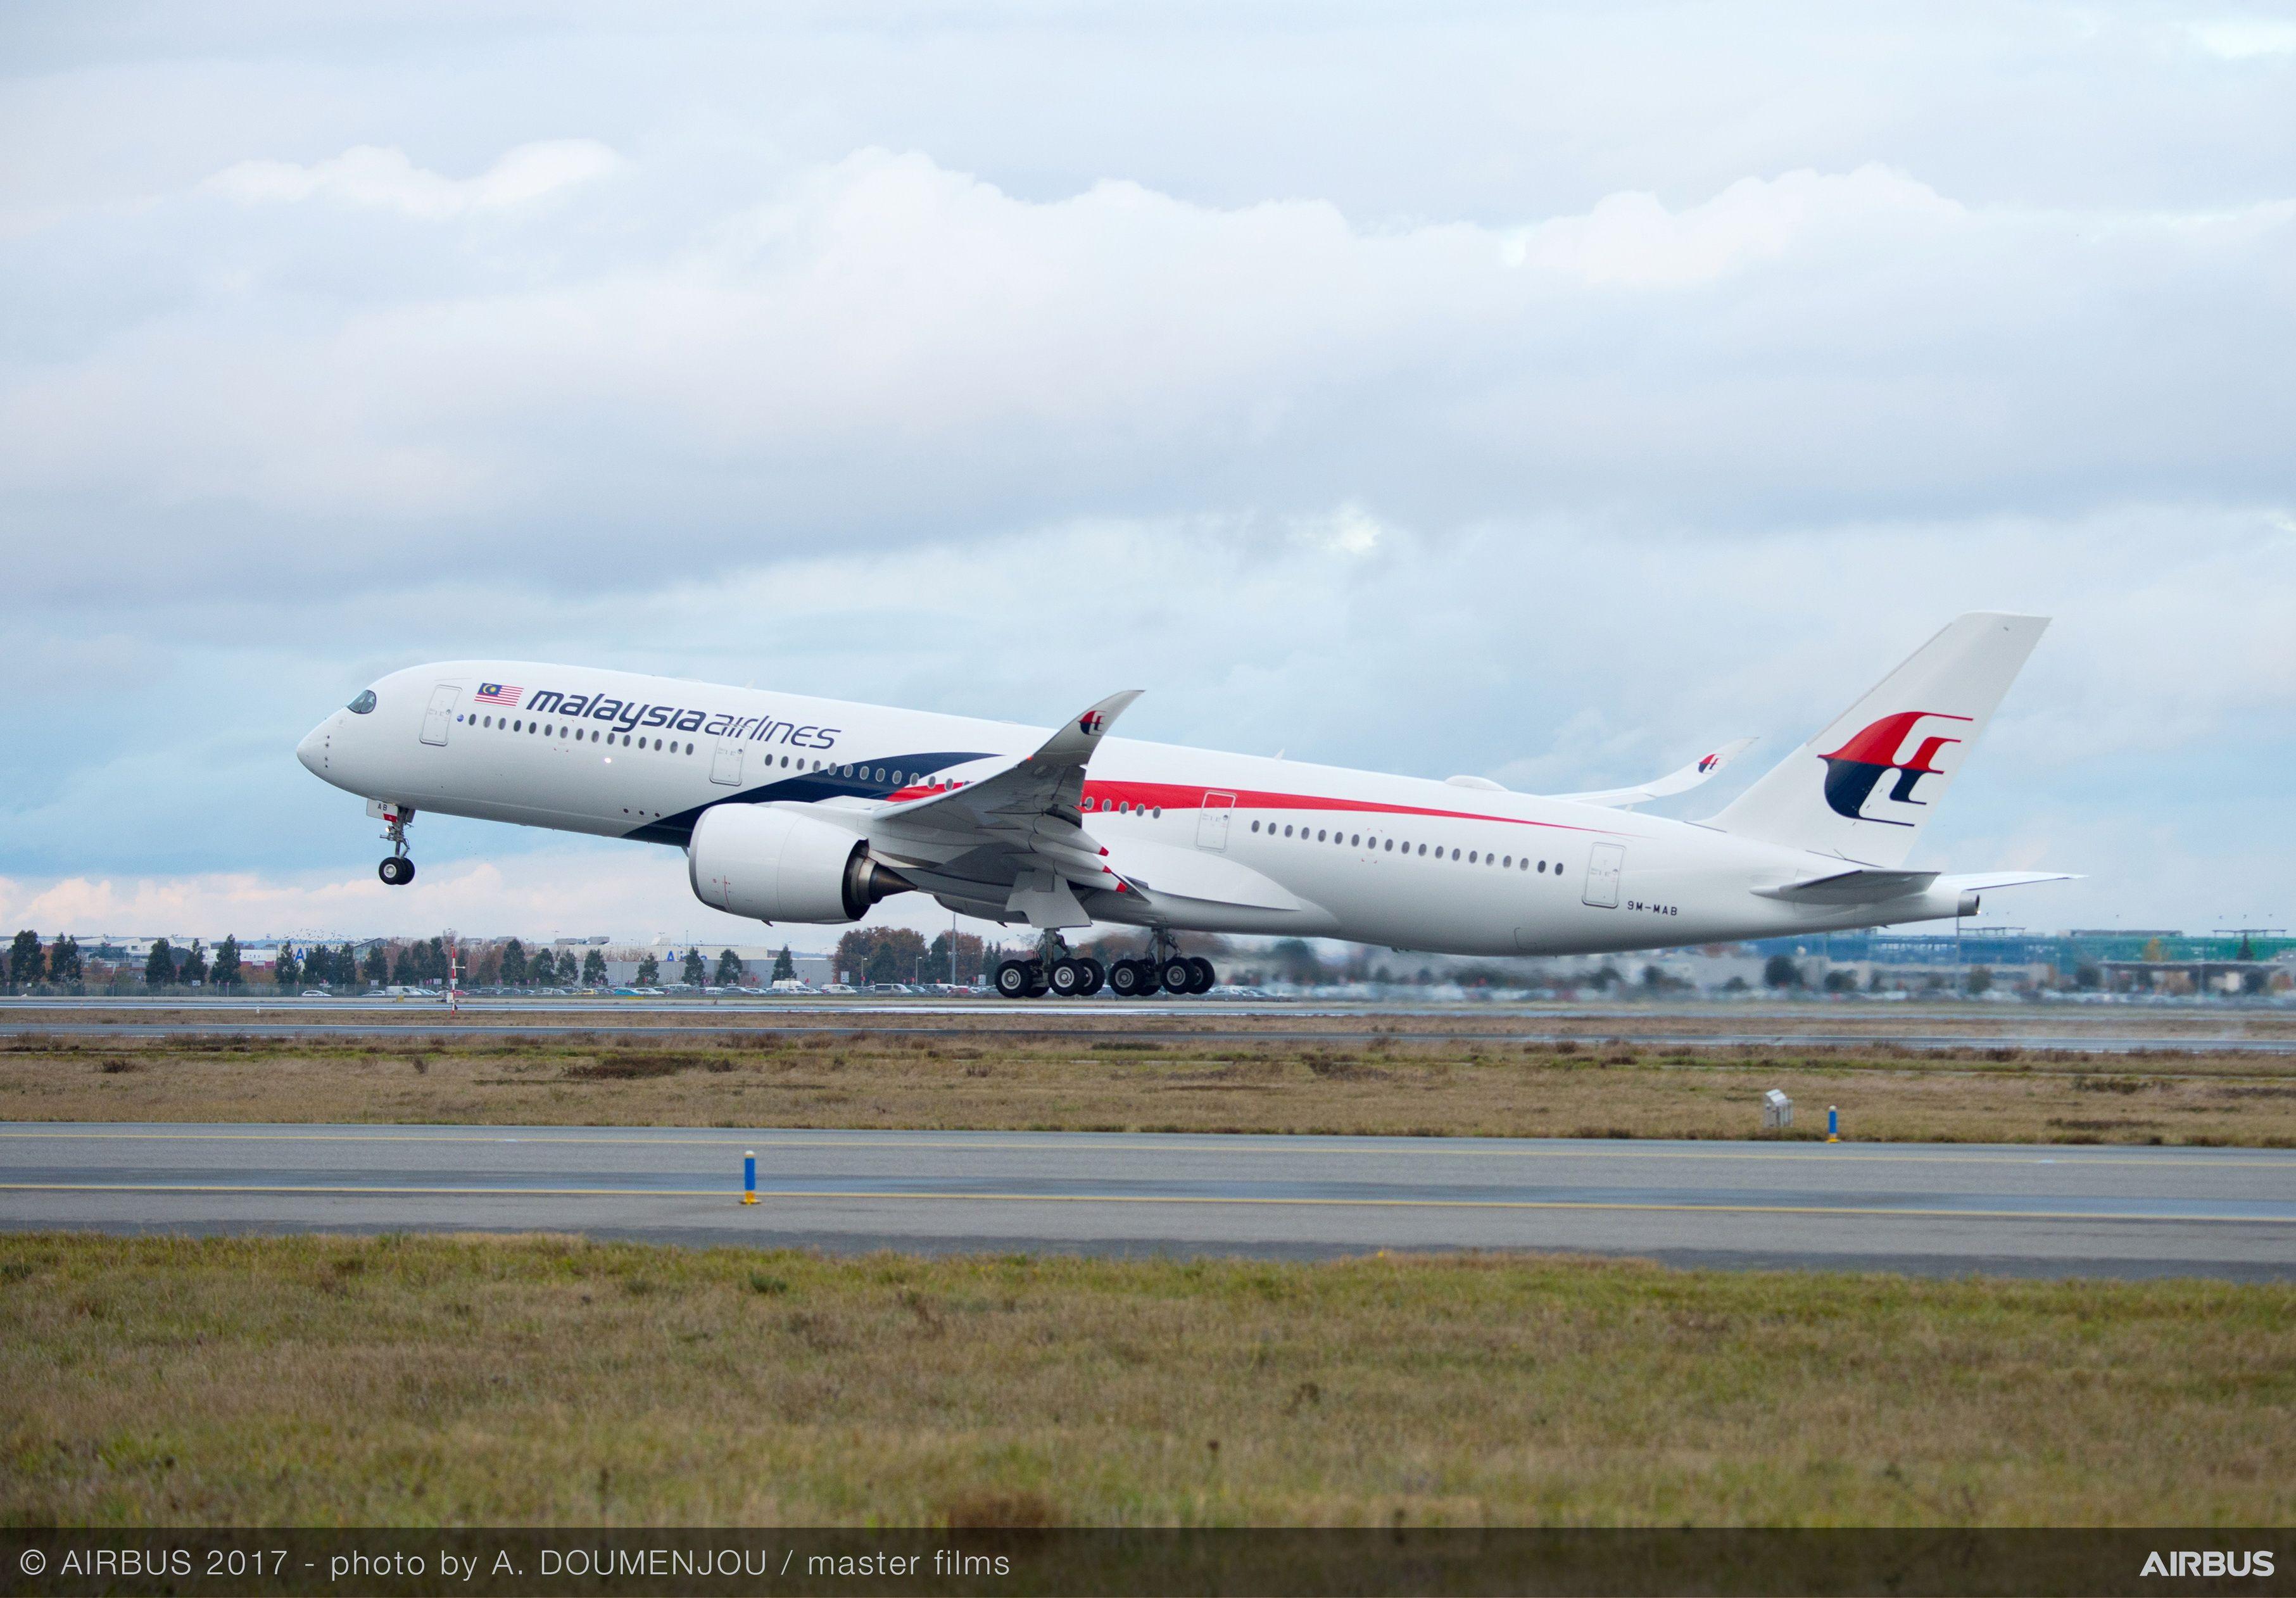 MALAYSIA AIRLINES VUELVE A SUDAMÉRICA MEDIANTE UN ACUERDO